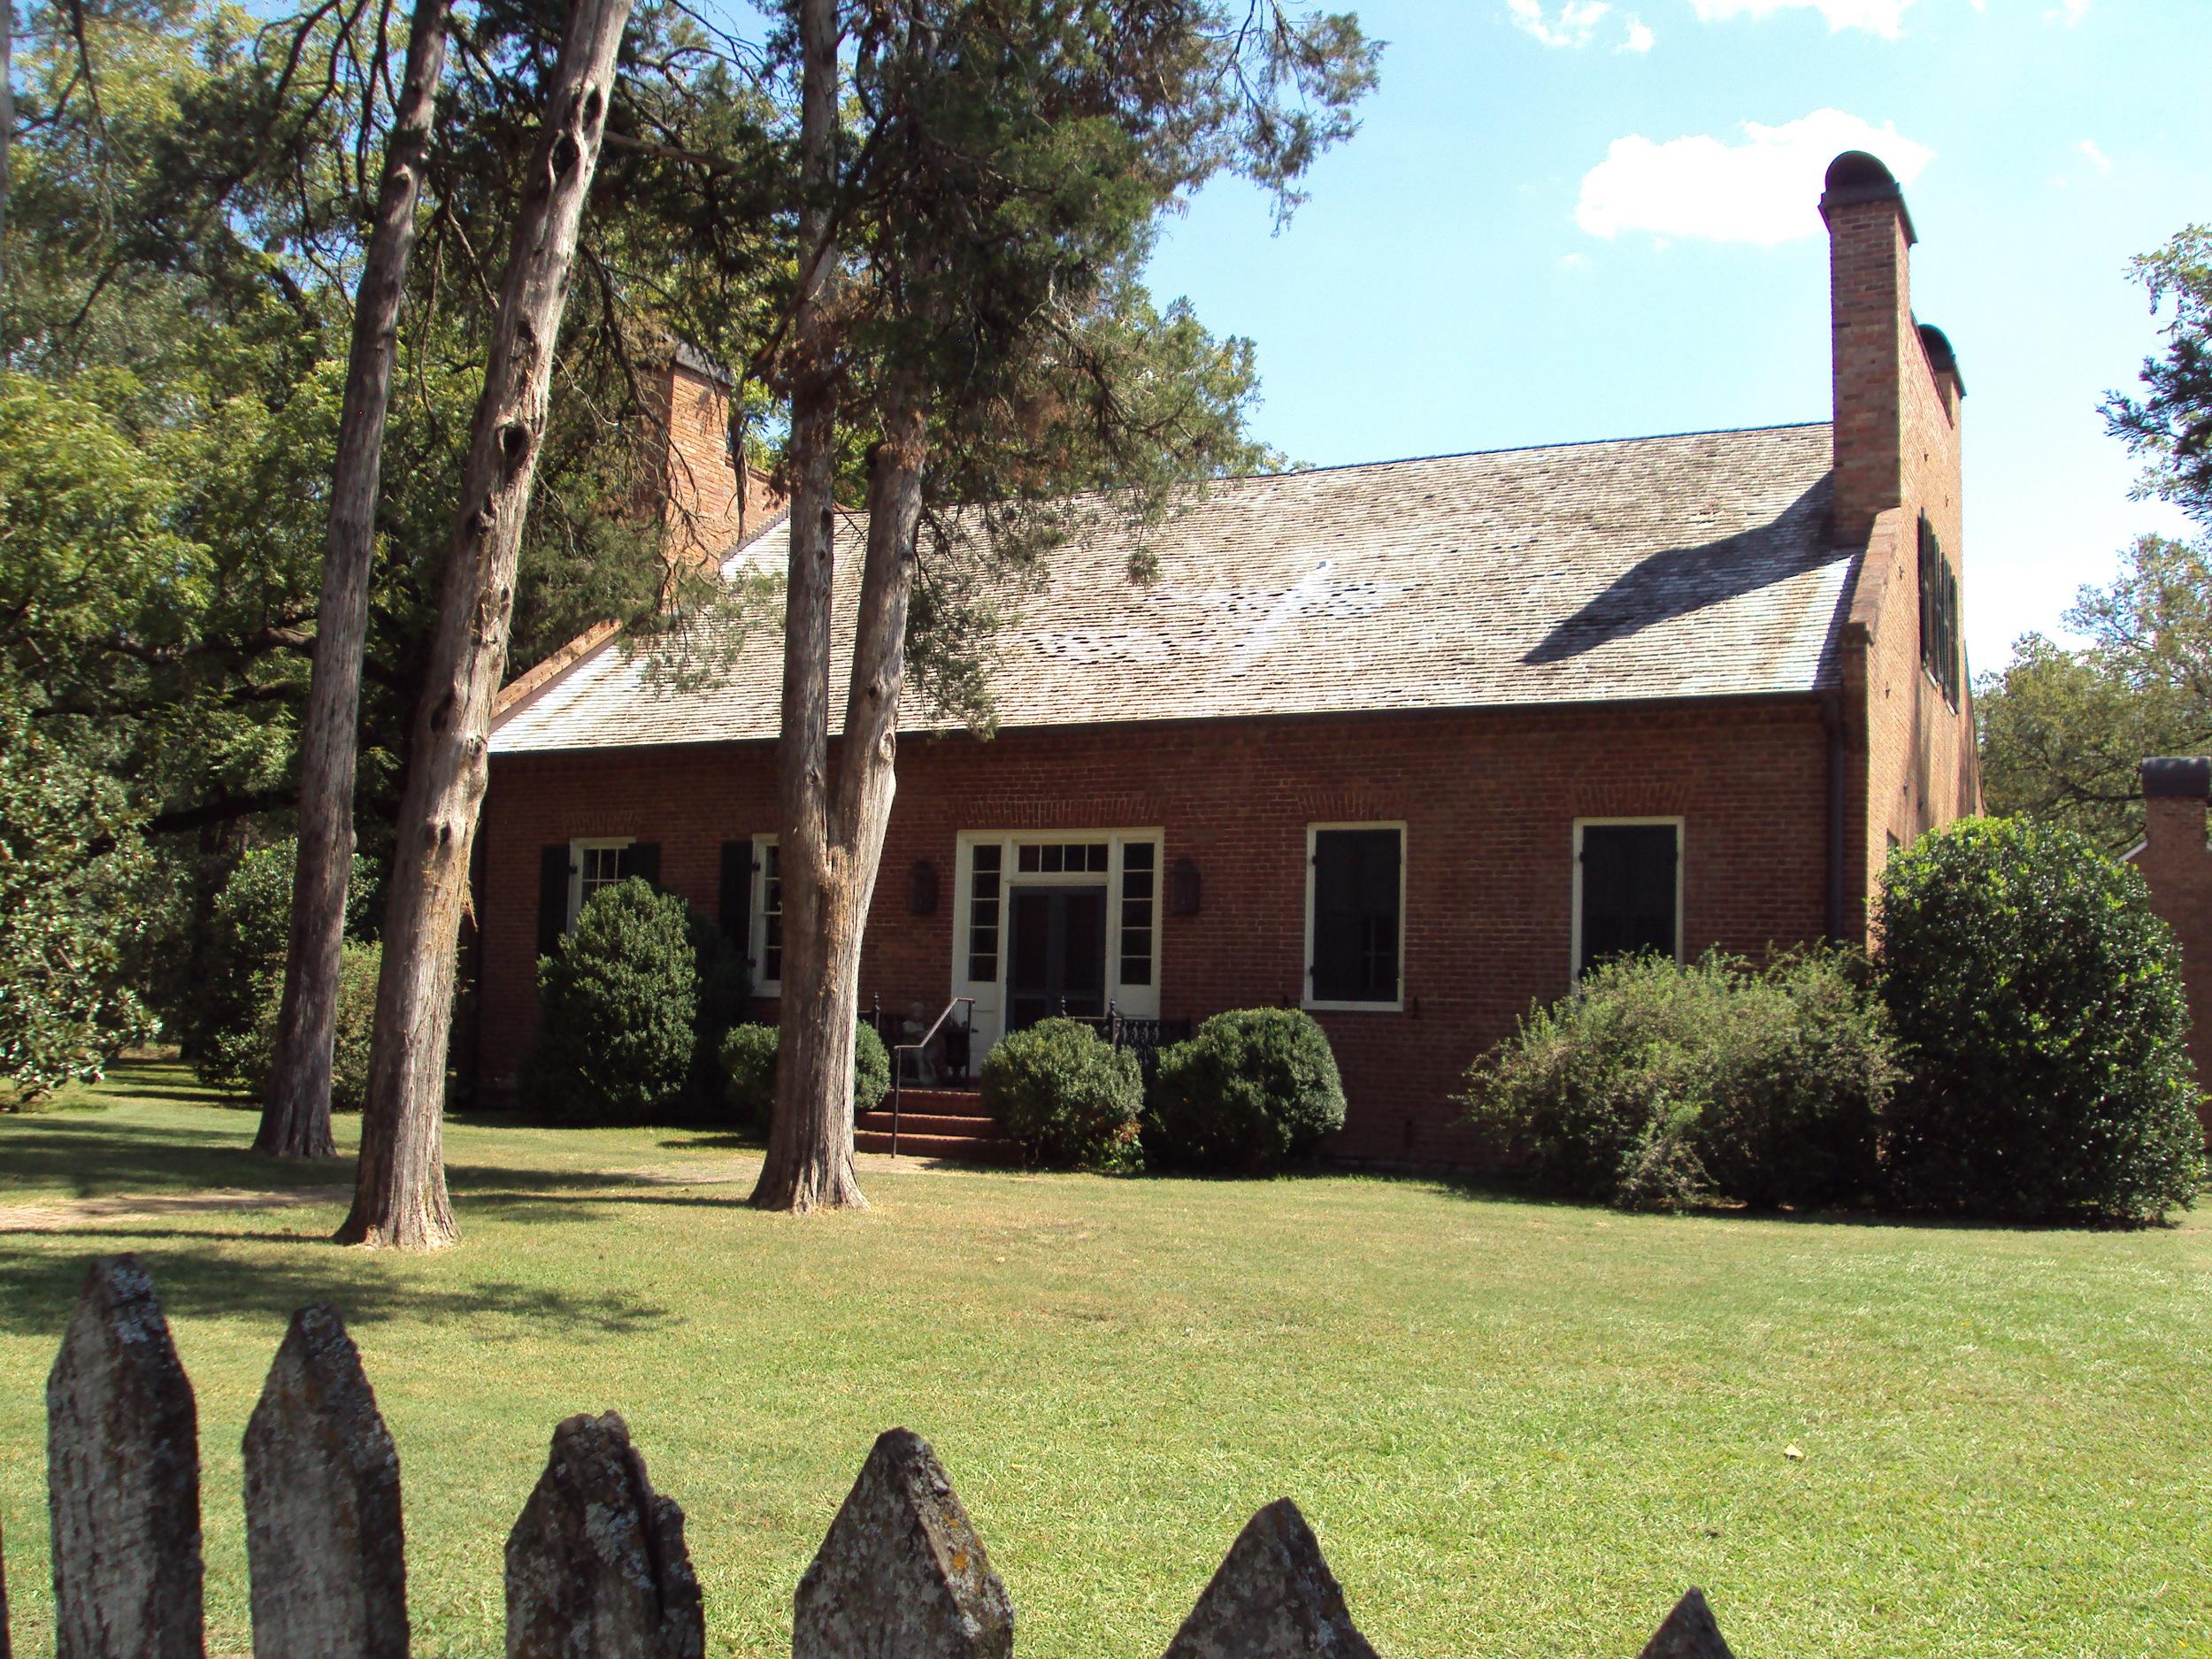 The Ten-Mile House, where David O. Dodd was imprisoned